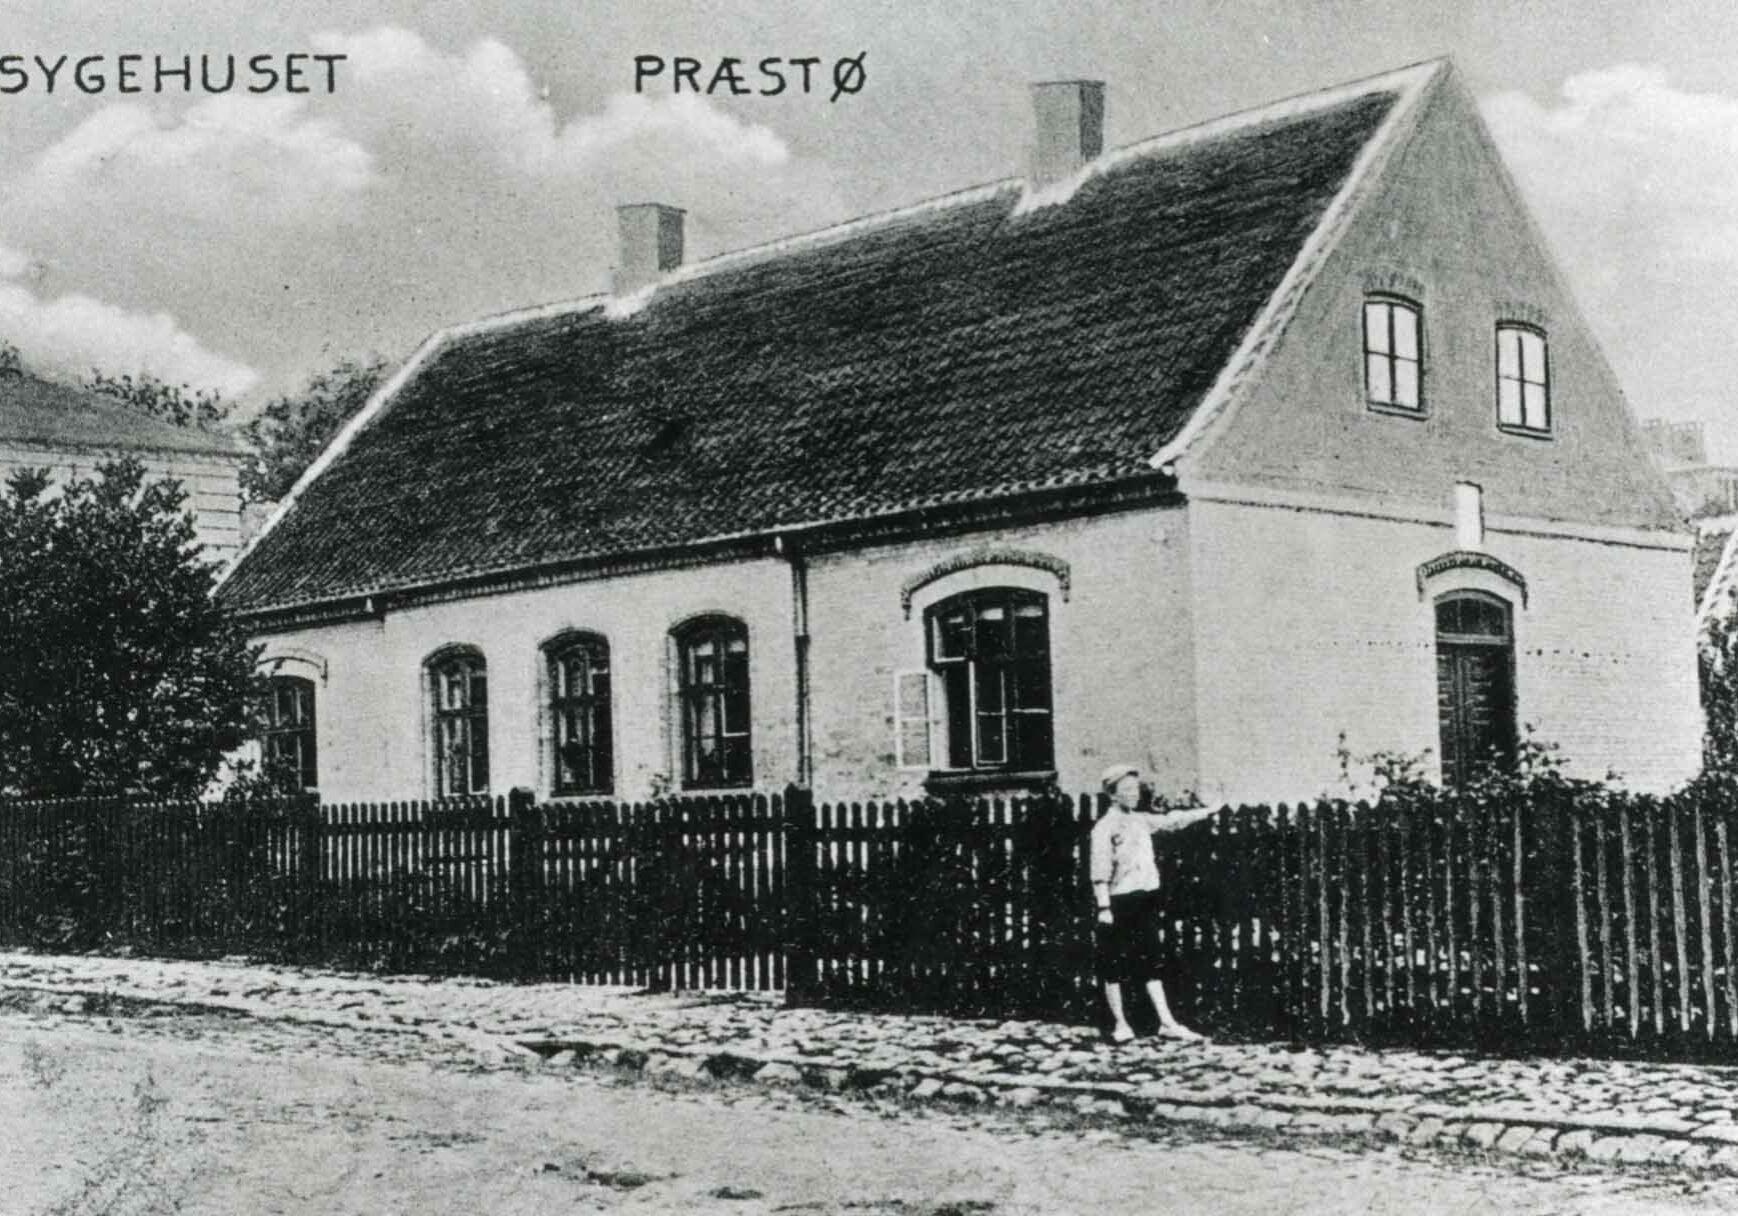 Præstø gamle sygehus (B2192)